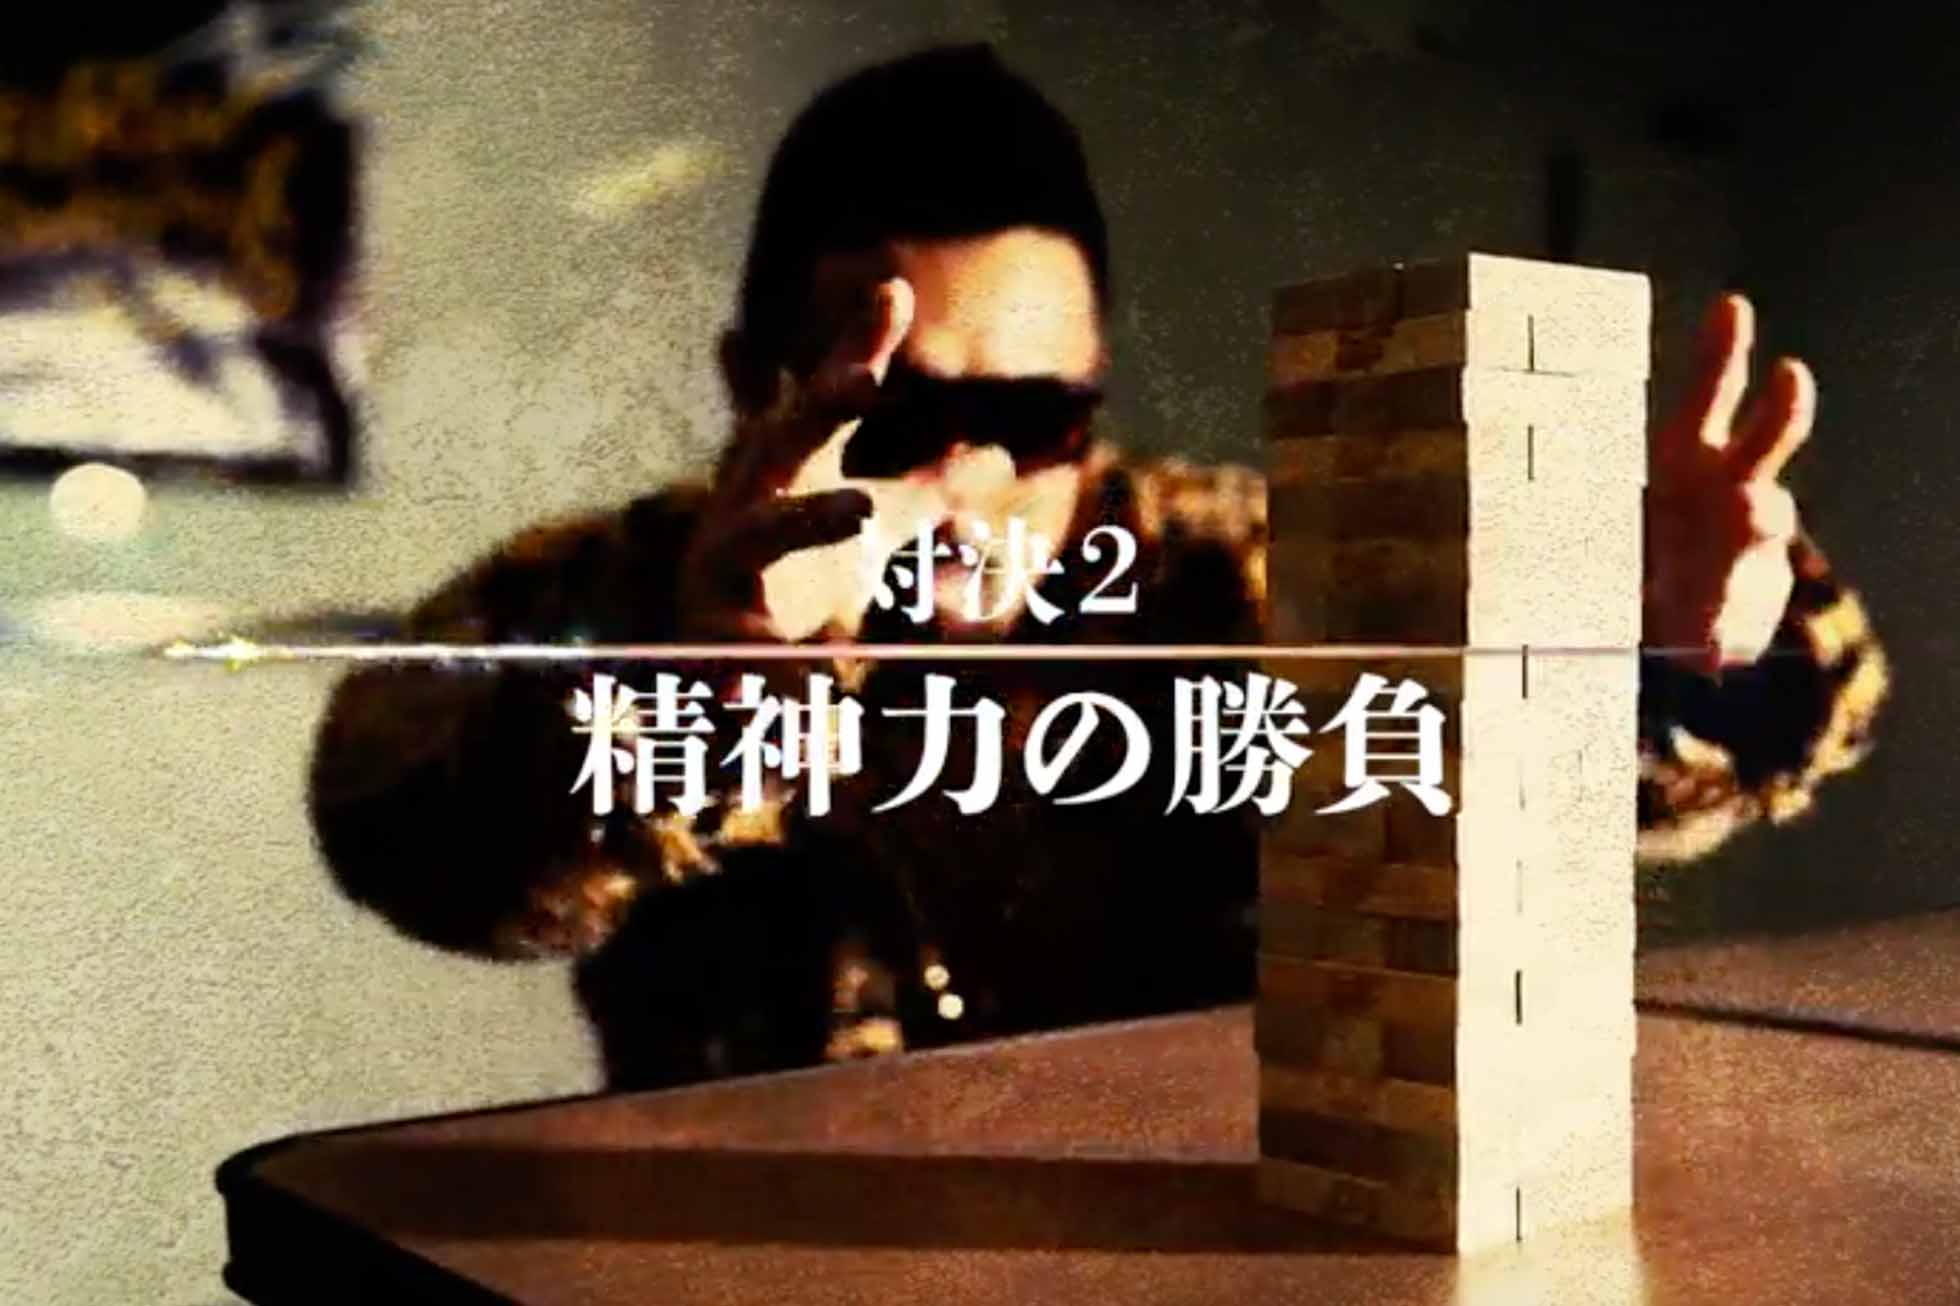 More CADENCE the MOVIE 精神力